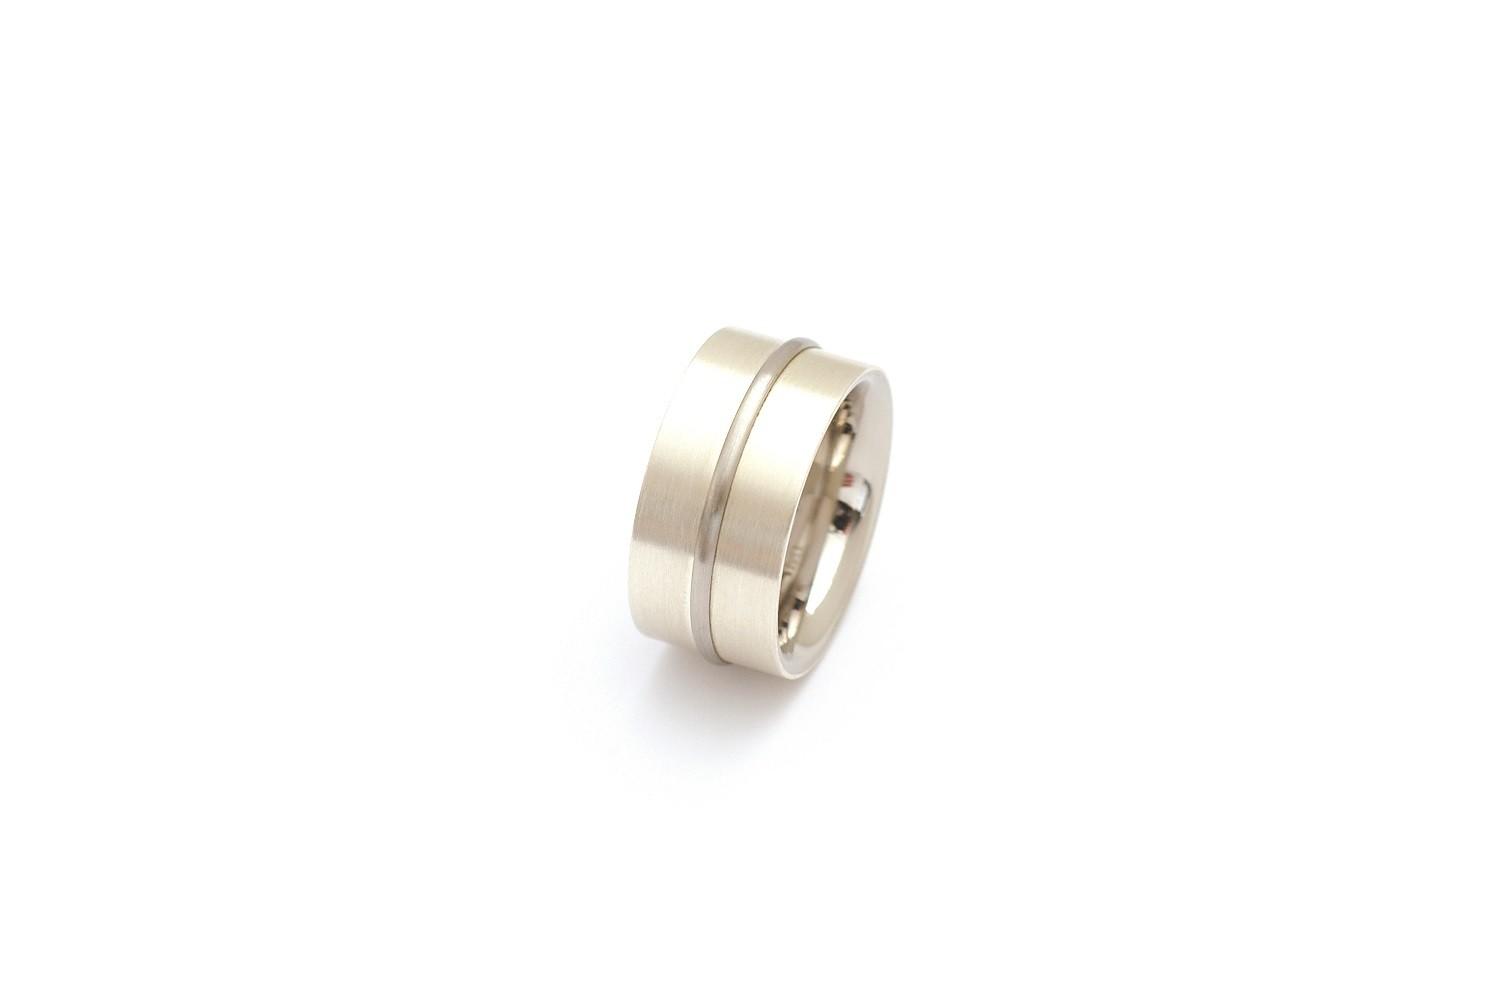 Bandring 925 Silber Edelstahl - Carl Dau - SR-CXL/41